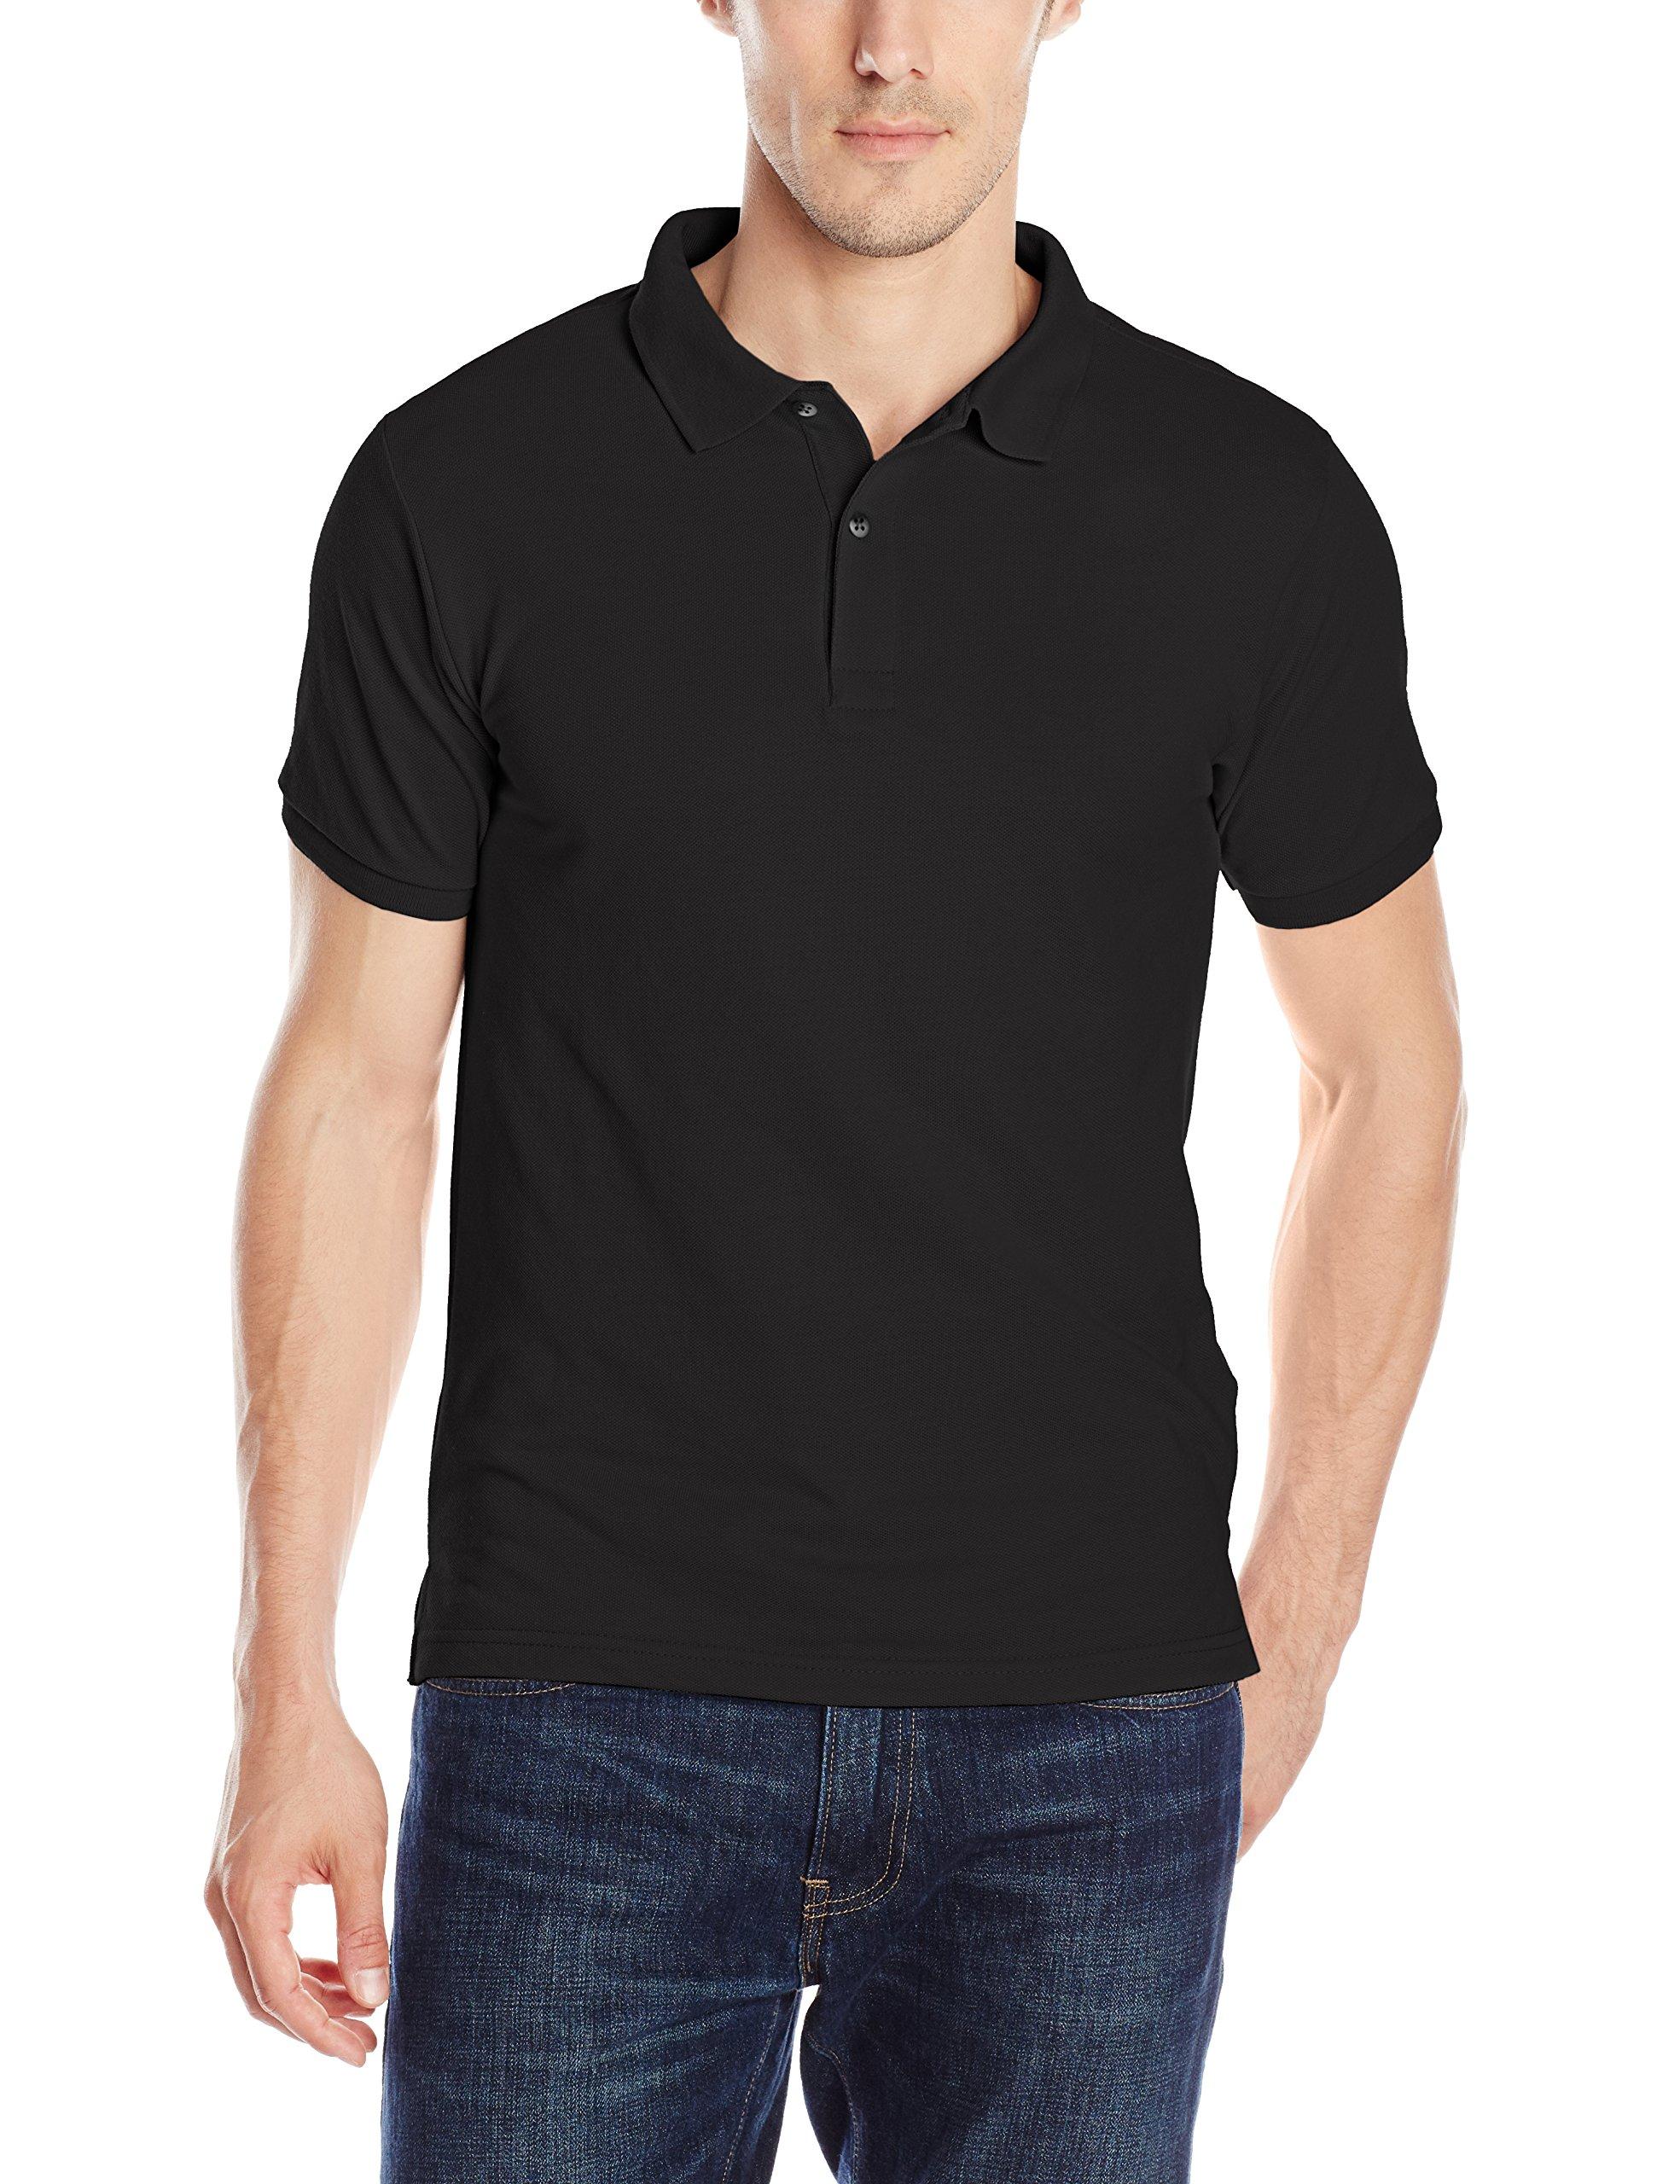 IZOD Uniform Young Men's Short Sleeve Pique Polo, Black, Small by IZOD